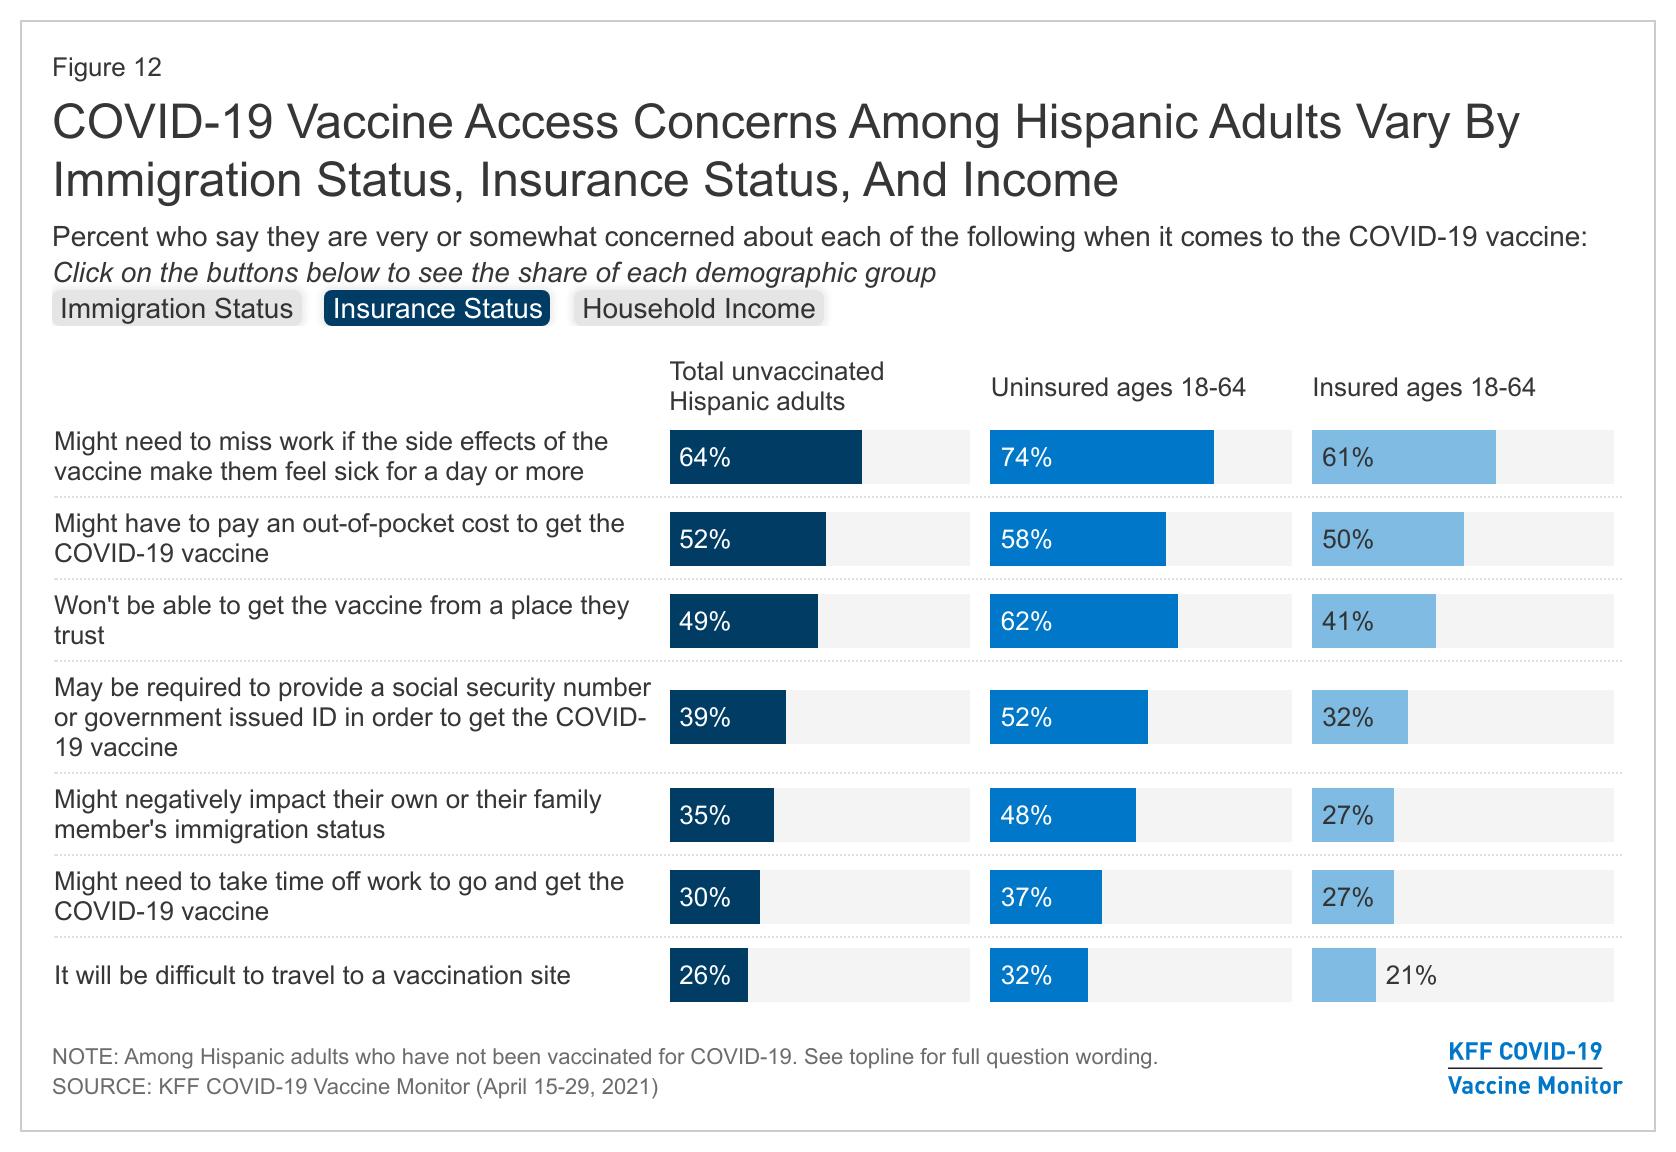 Vaccine Concerns Among Hispanic Adults